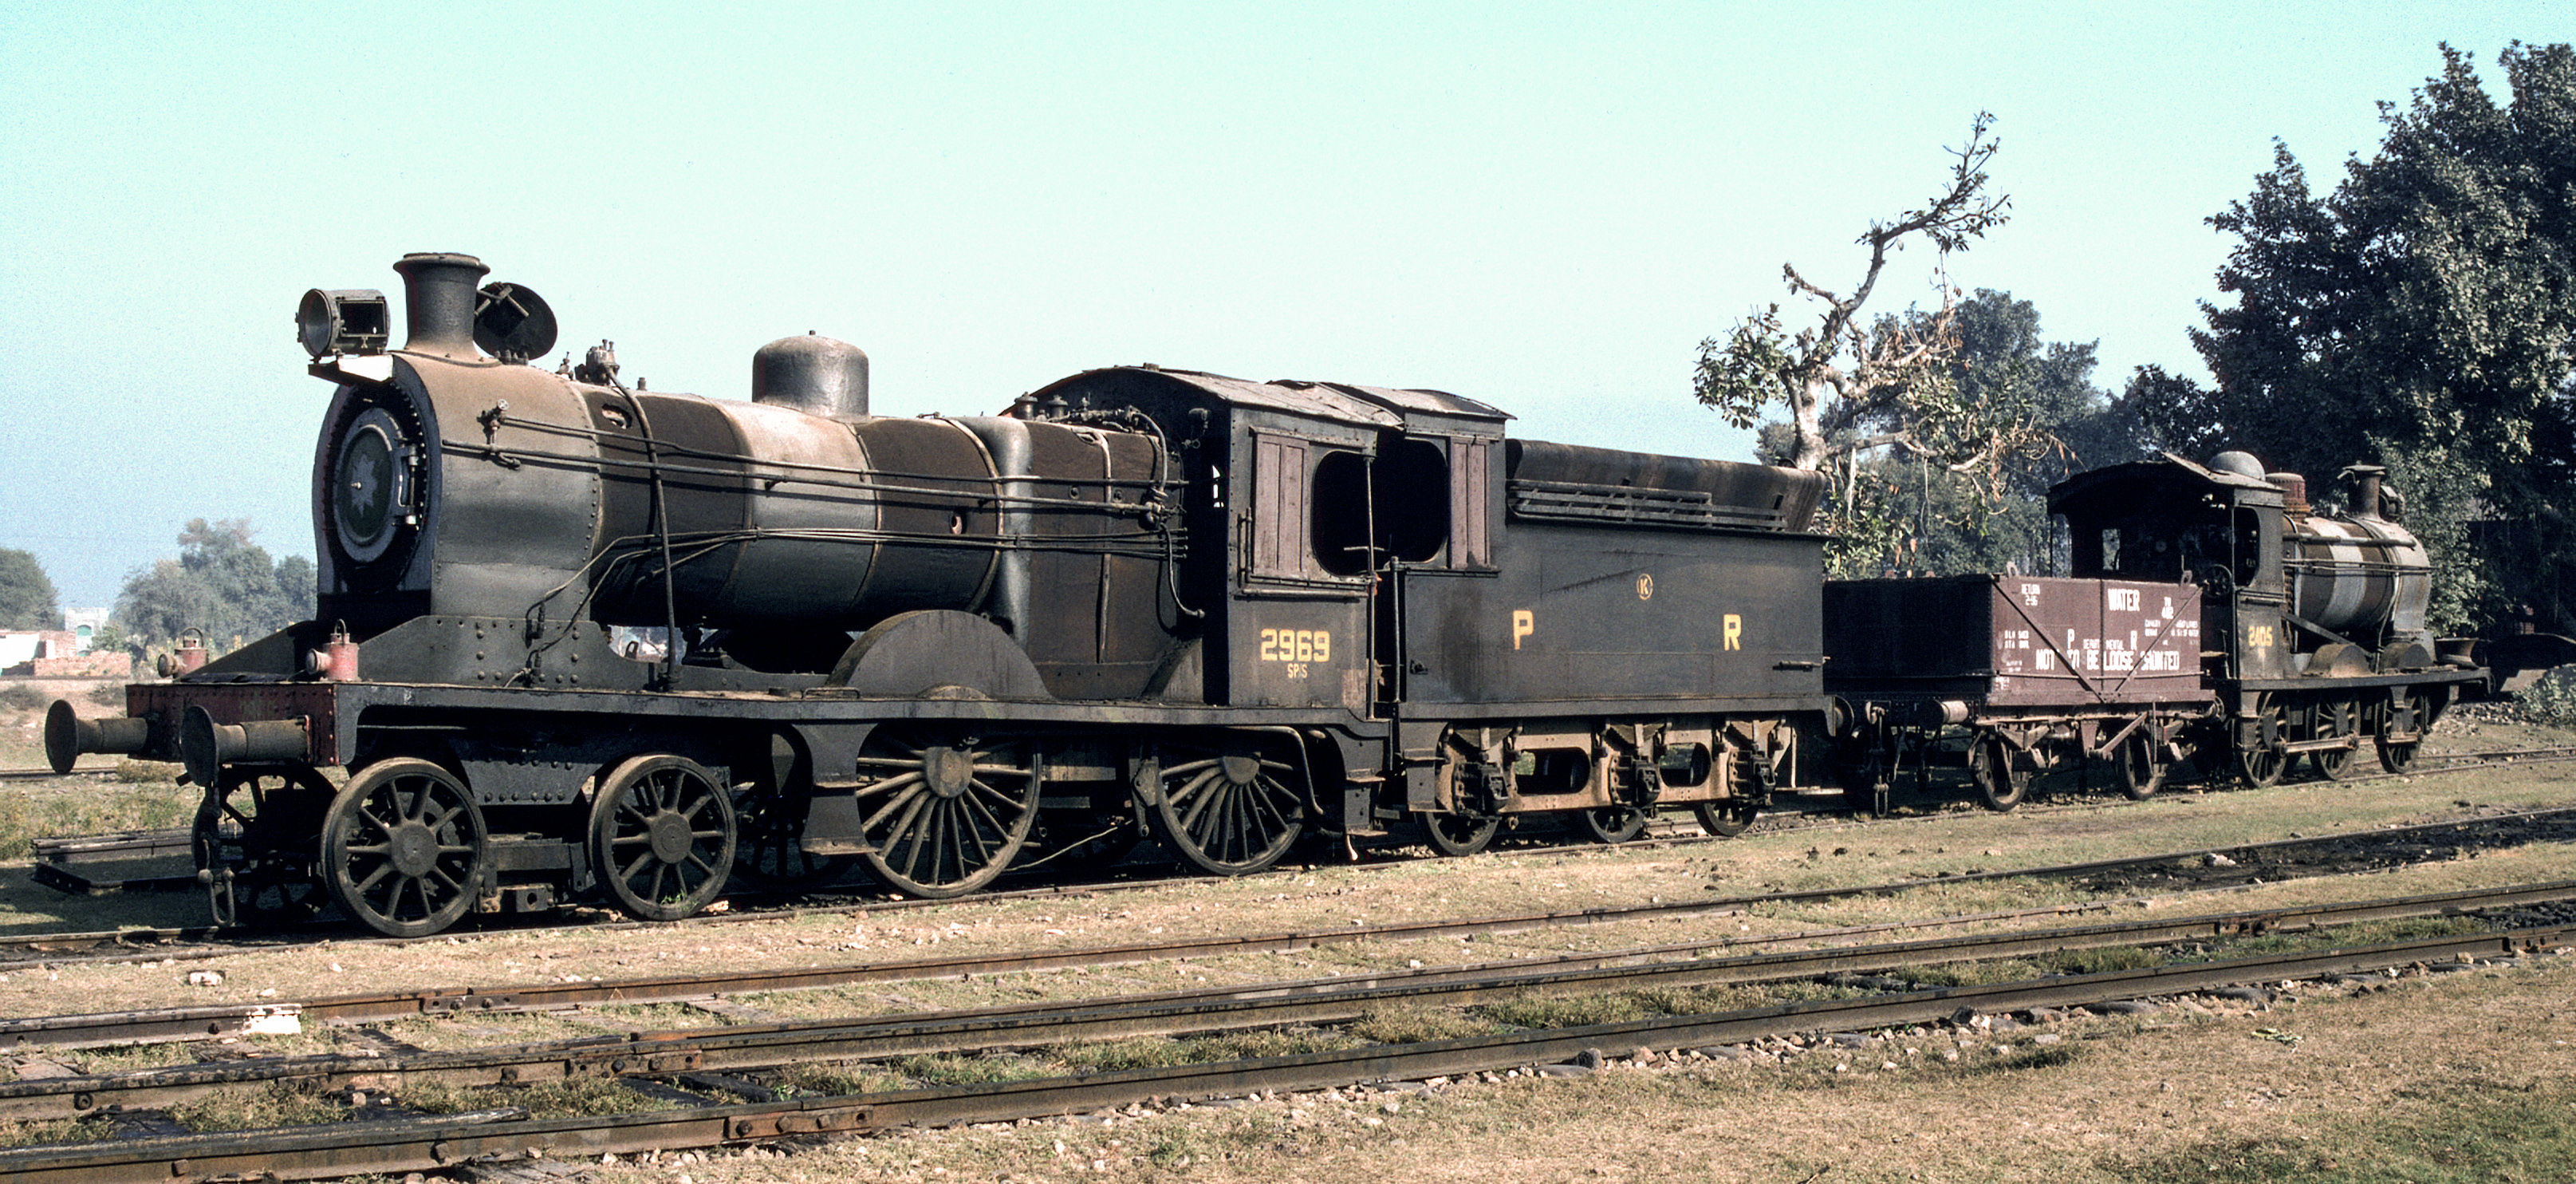 Malakwal my Heaven, Steam, Steam engine, Train, Vehicle, HQ Photo